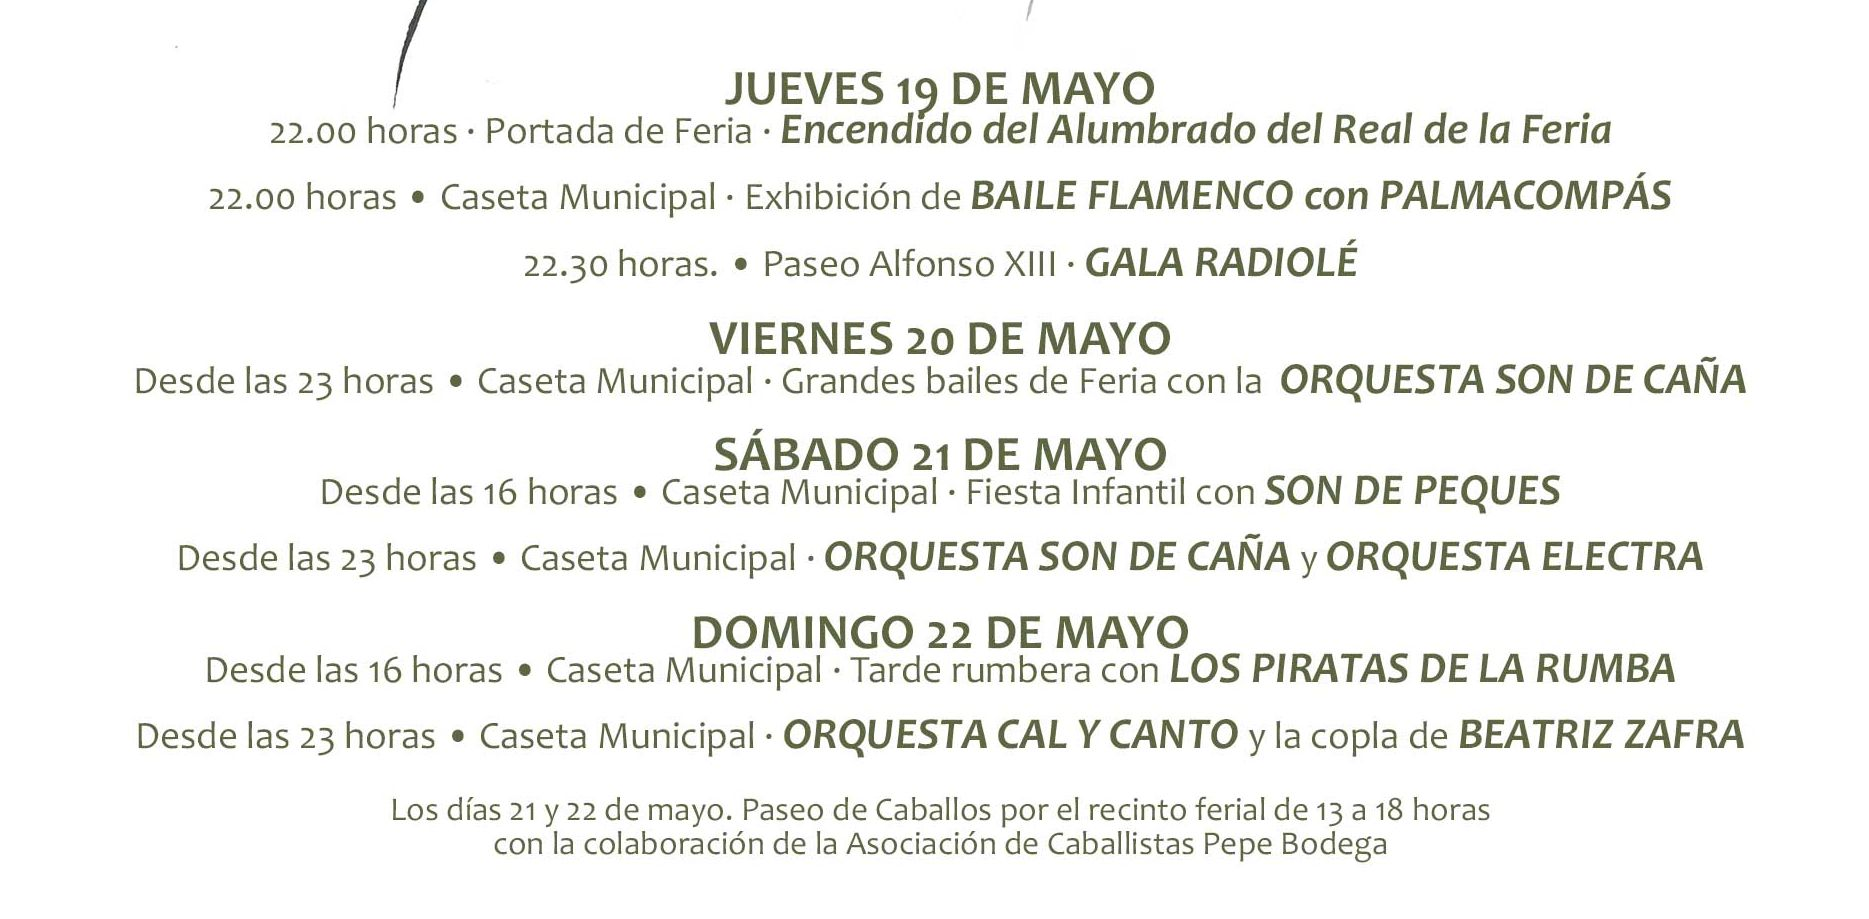 https://www.palmadelrio.es/sites/default/files/1.cartel-programa-feria-mayo-2016web_0.jpg